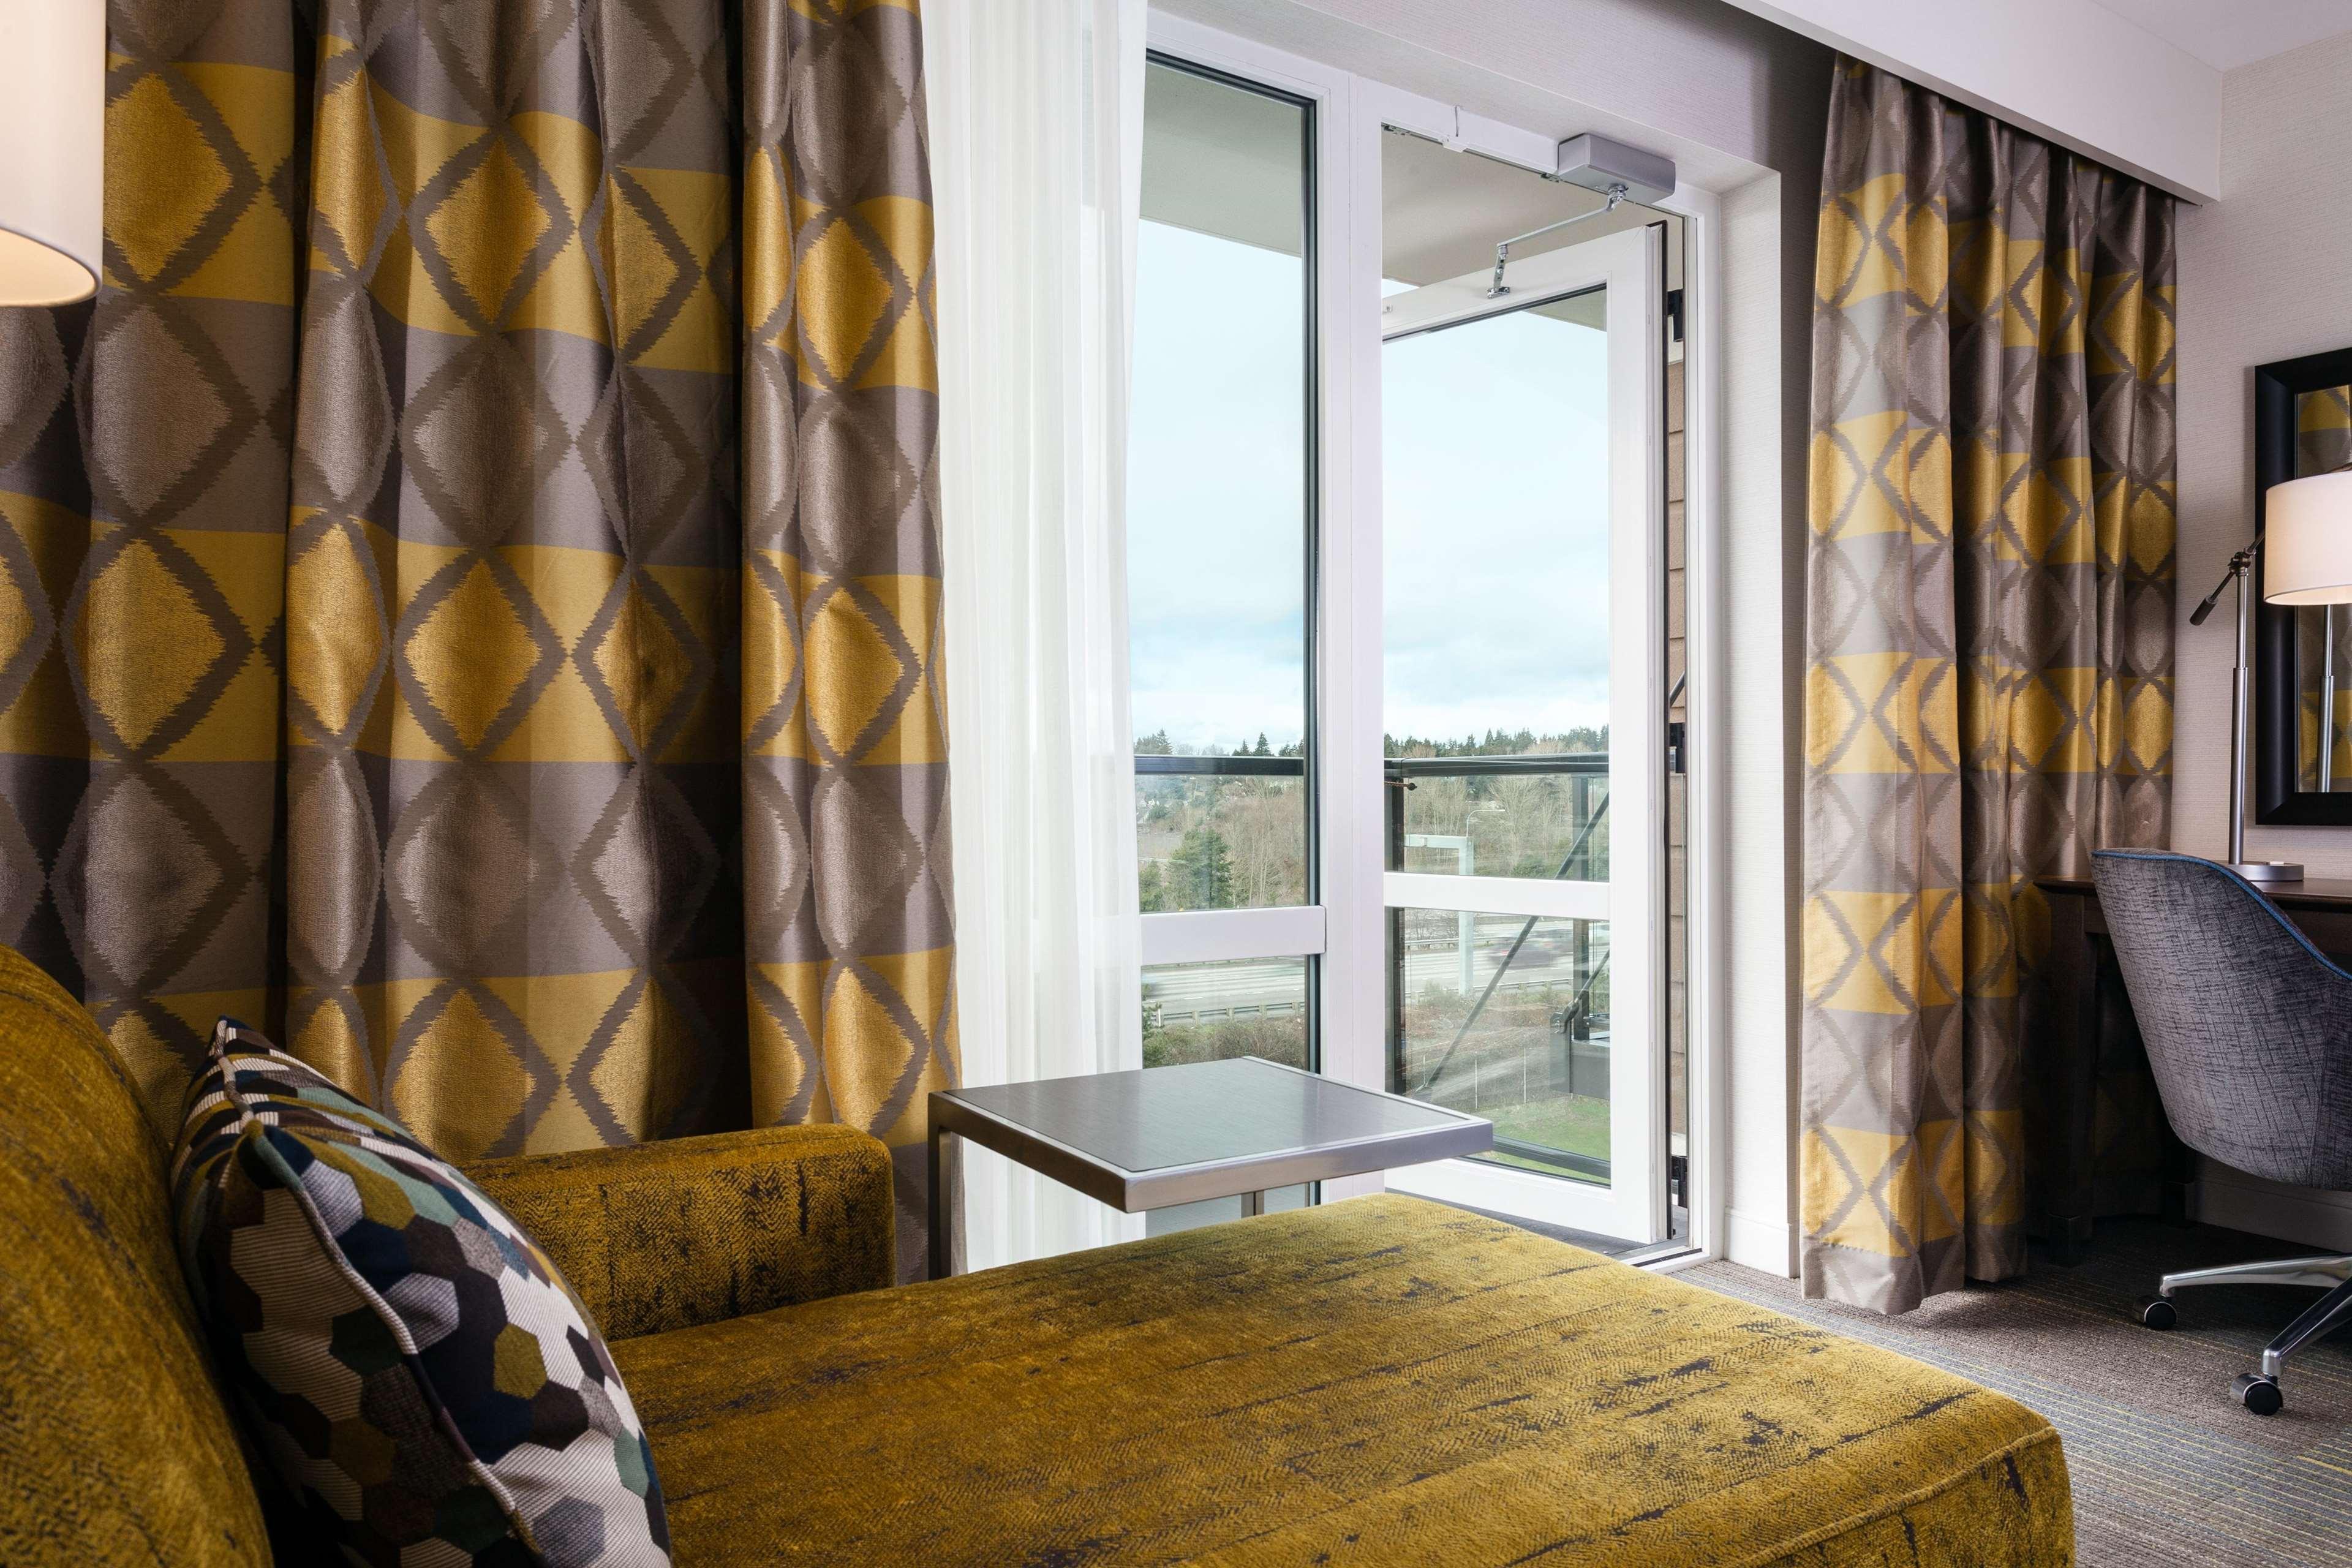 Hampton Inn & Suites by Hilton Seattle/Northgate image 31